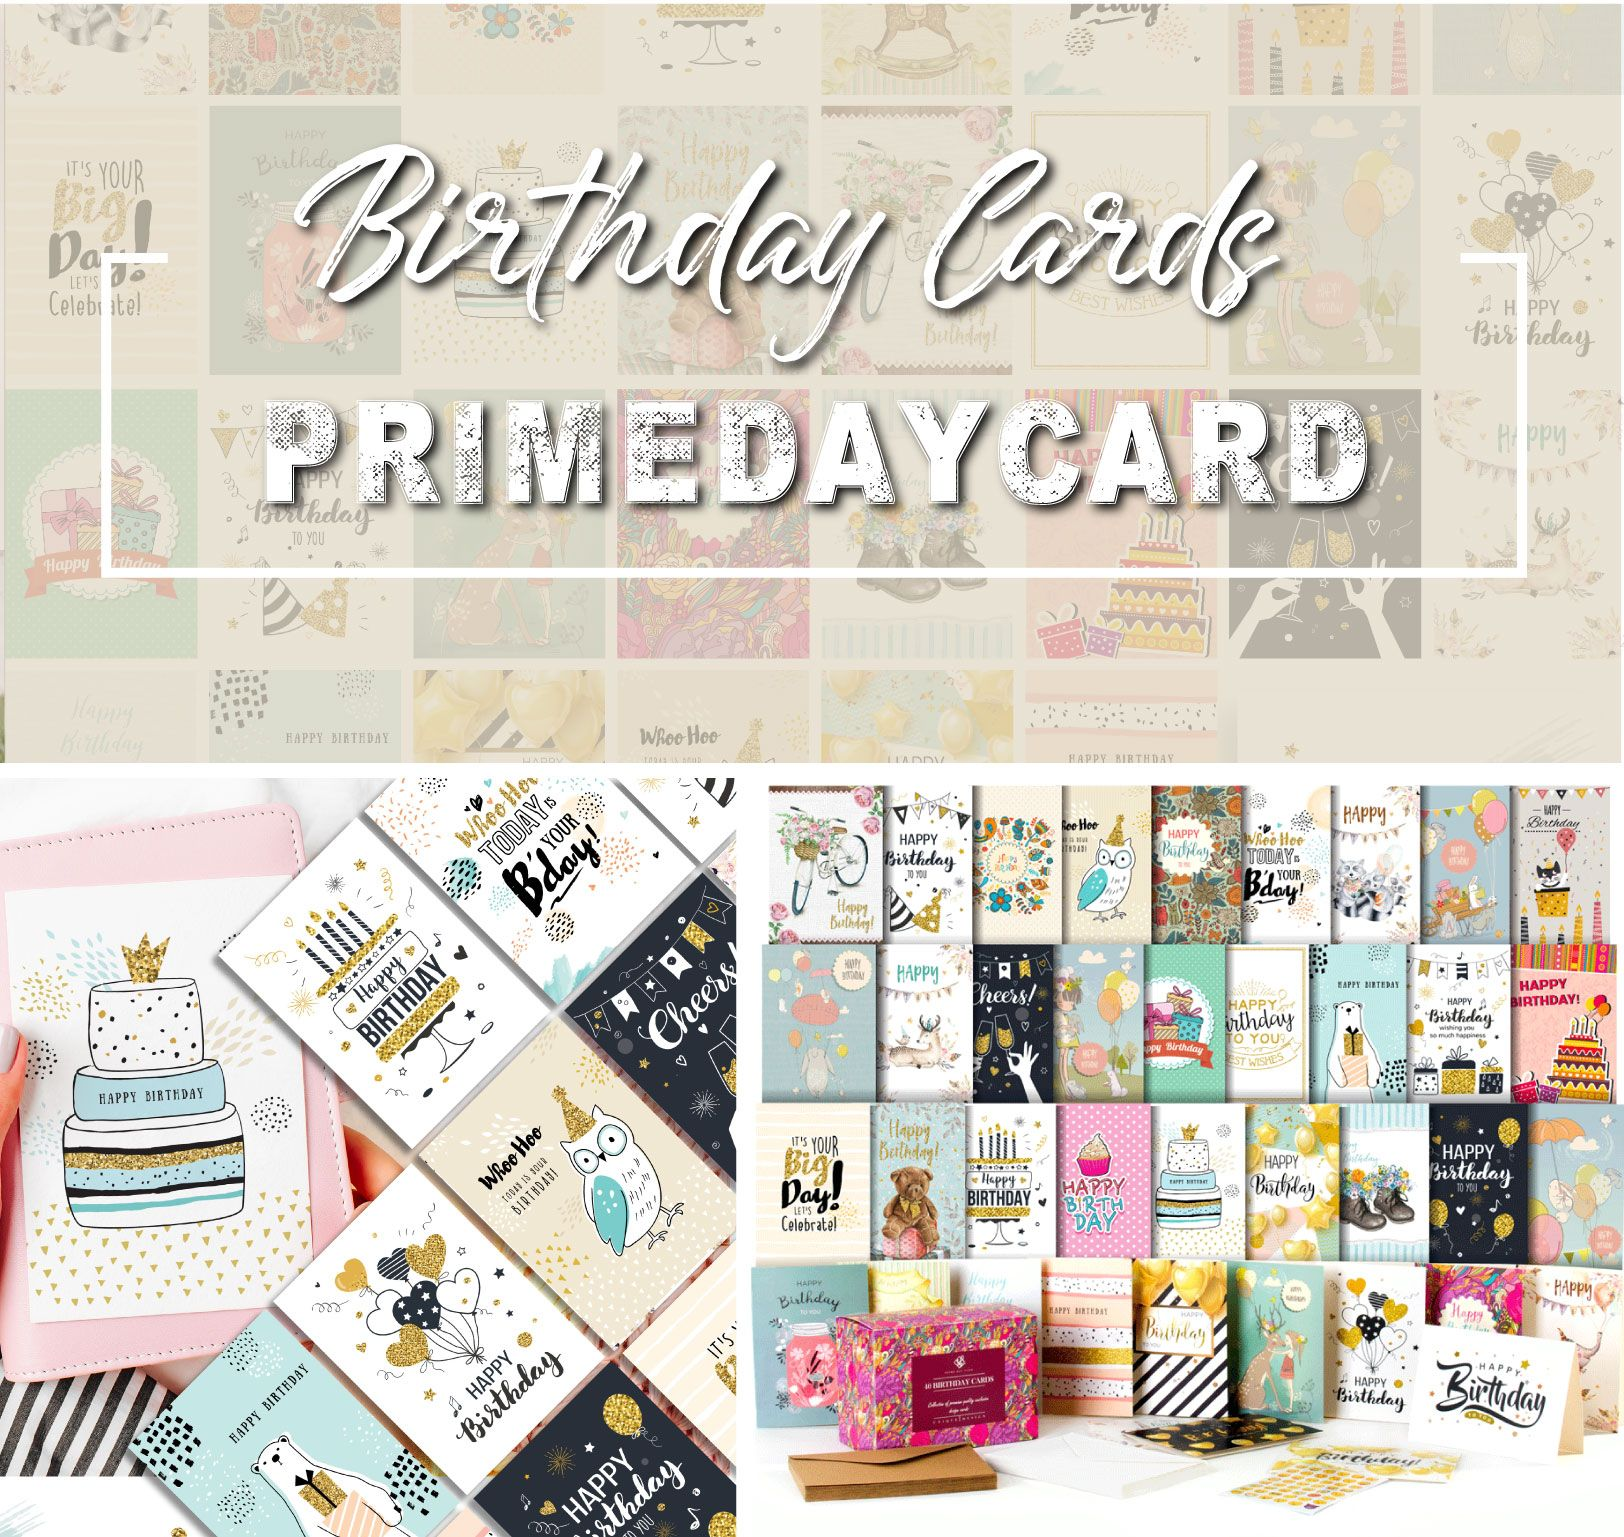 Happy Birthday Cards Assortment Birthday Cards For Men Birthday Cards Happy Birthday Cards